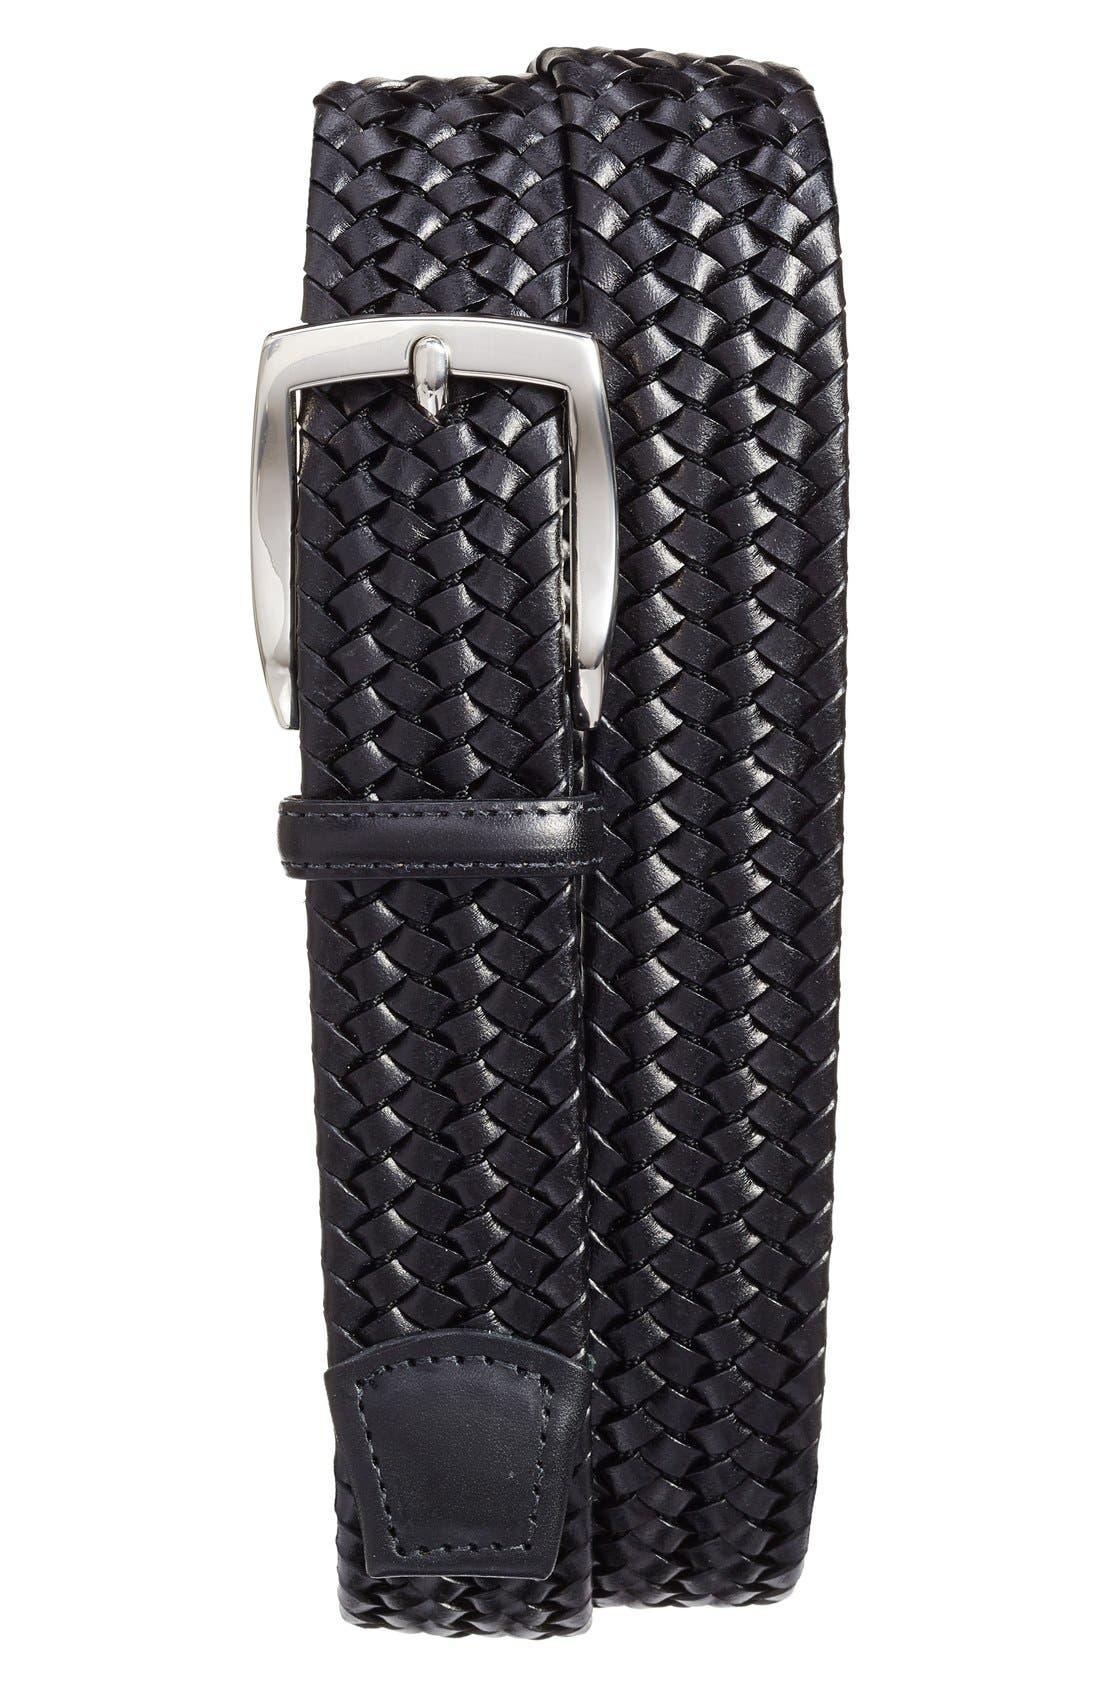 Torino Belts Woven Leather Belt, Black